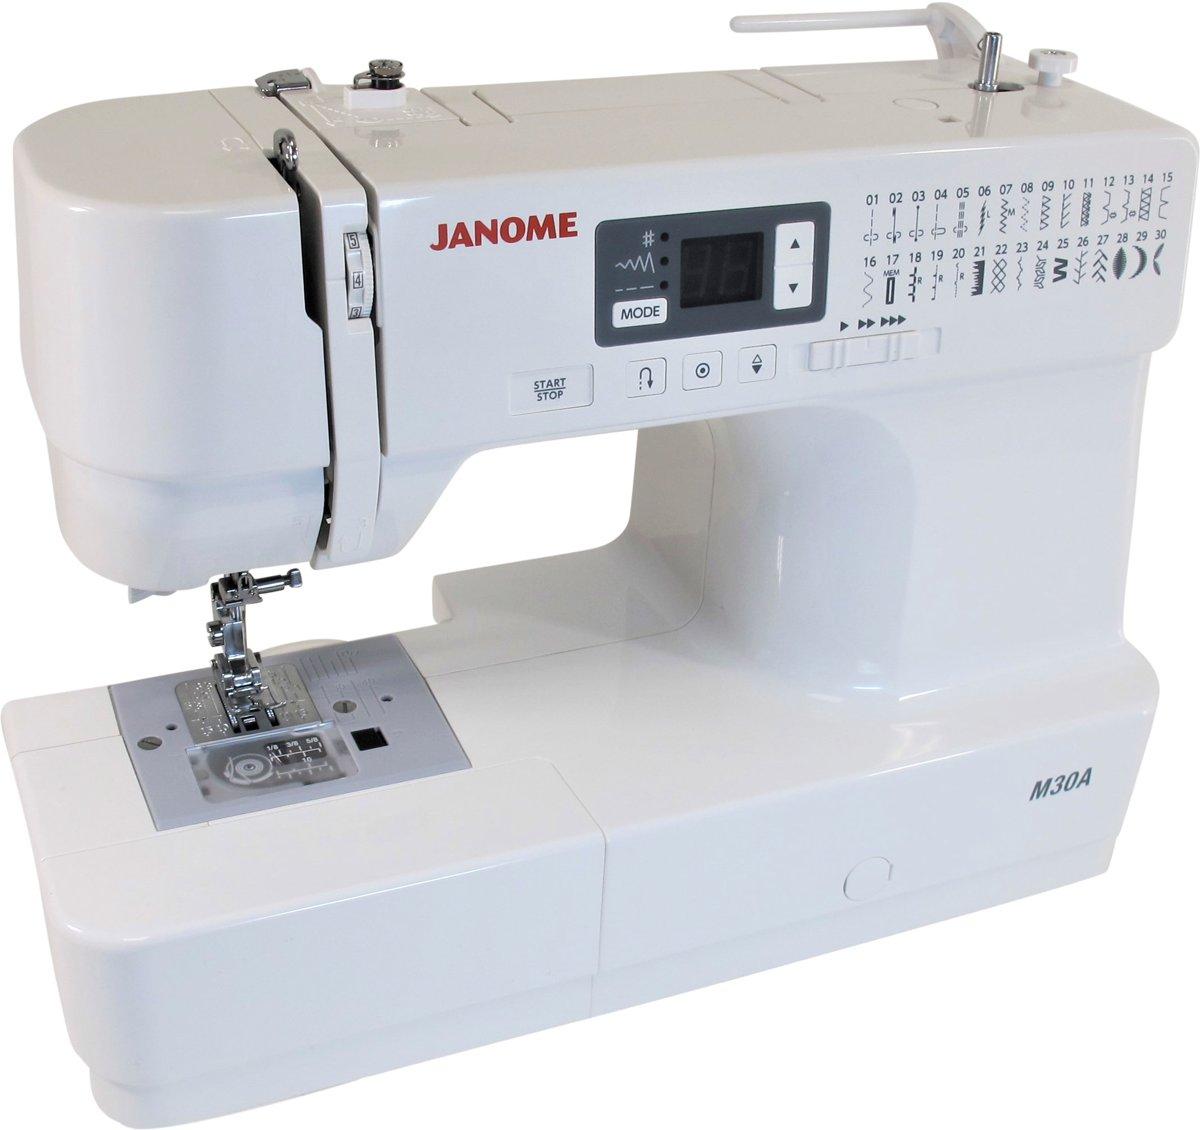 Janome M 30 Aktie Naaimachine